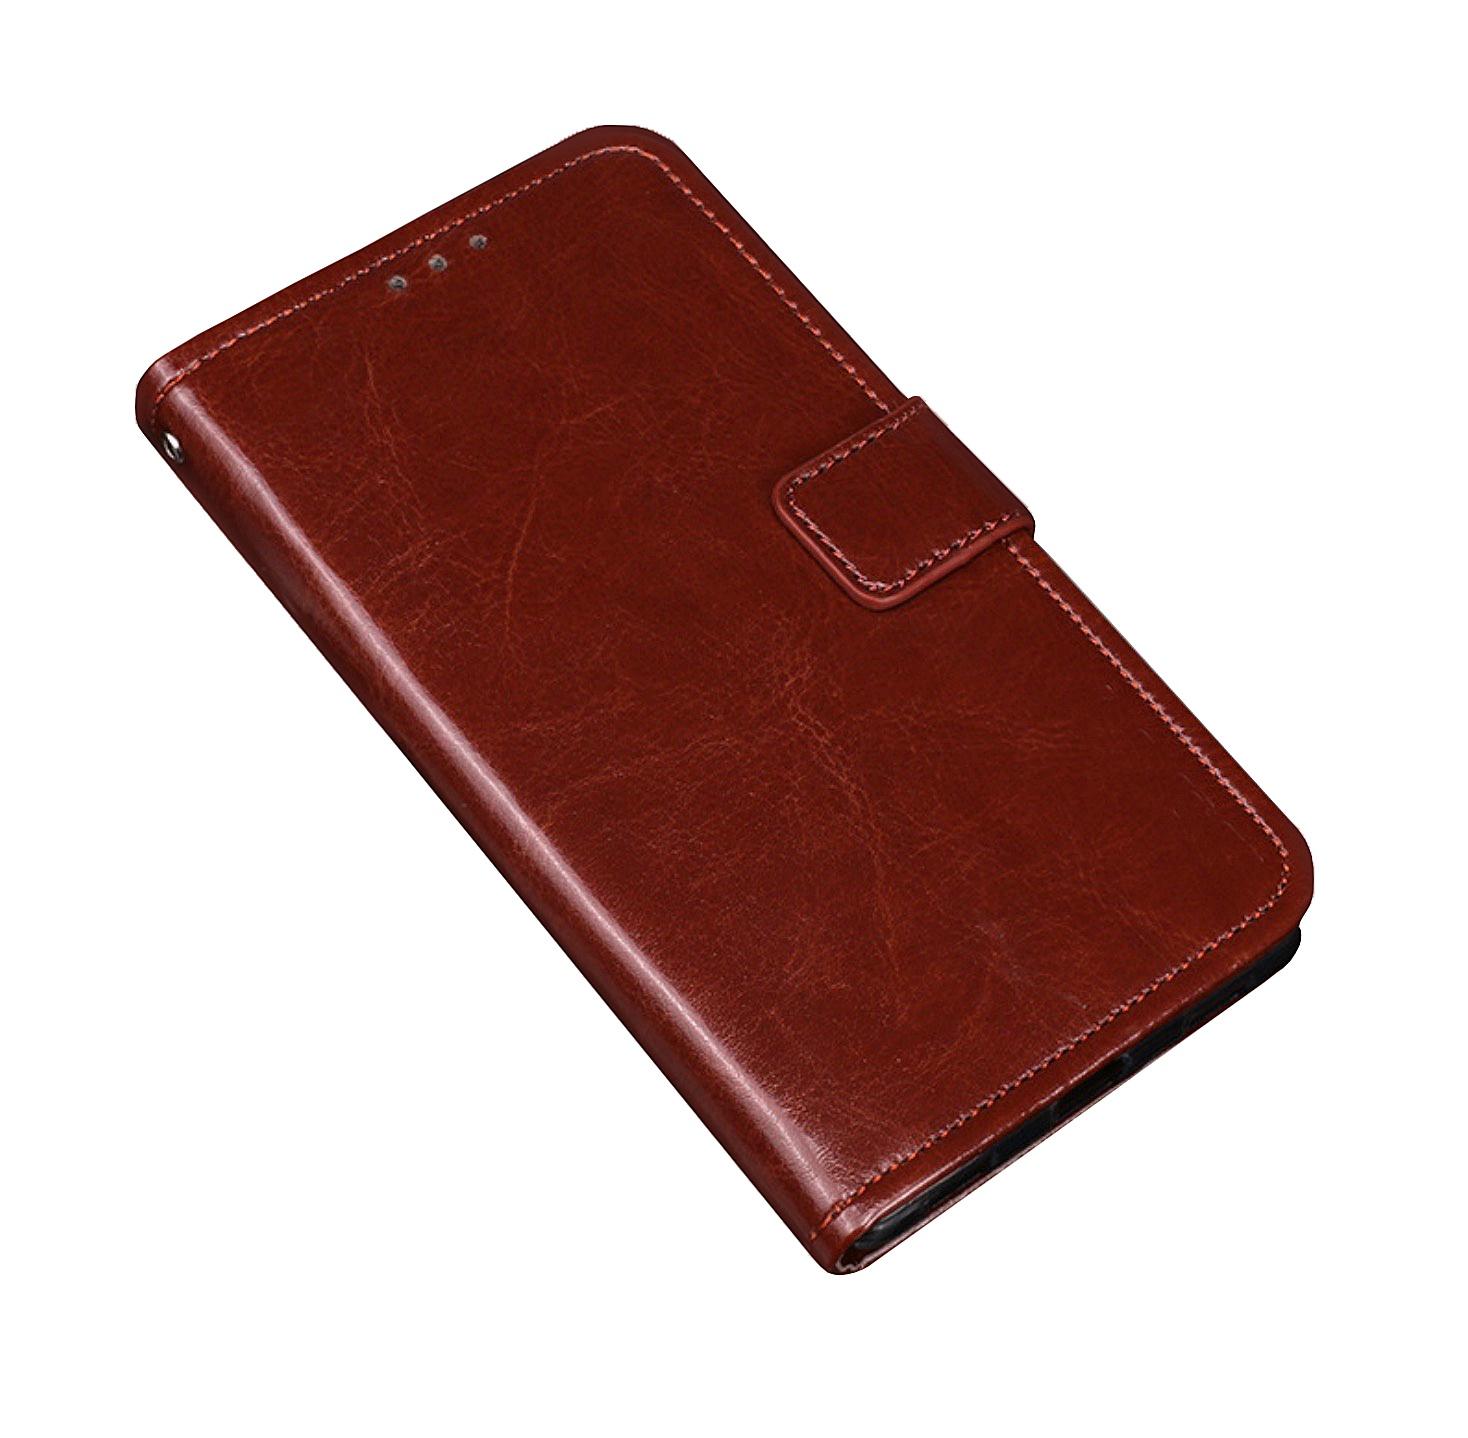 Чехол-книжка MyPads для Sony Xperia 10 Plus с мульти-подставкой застёжкой и визитницей коричневый